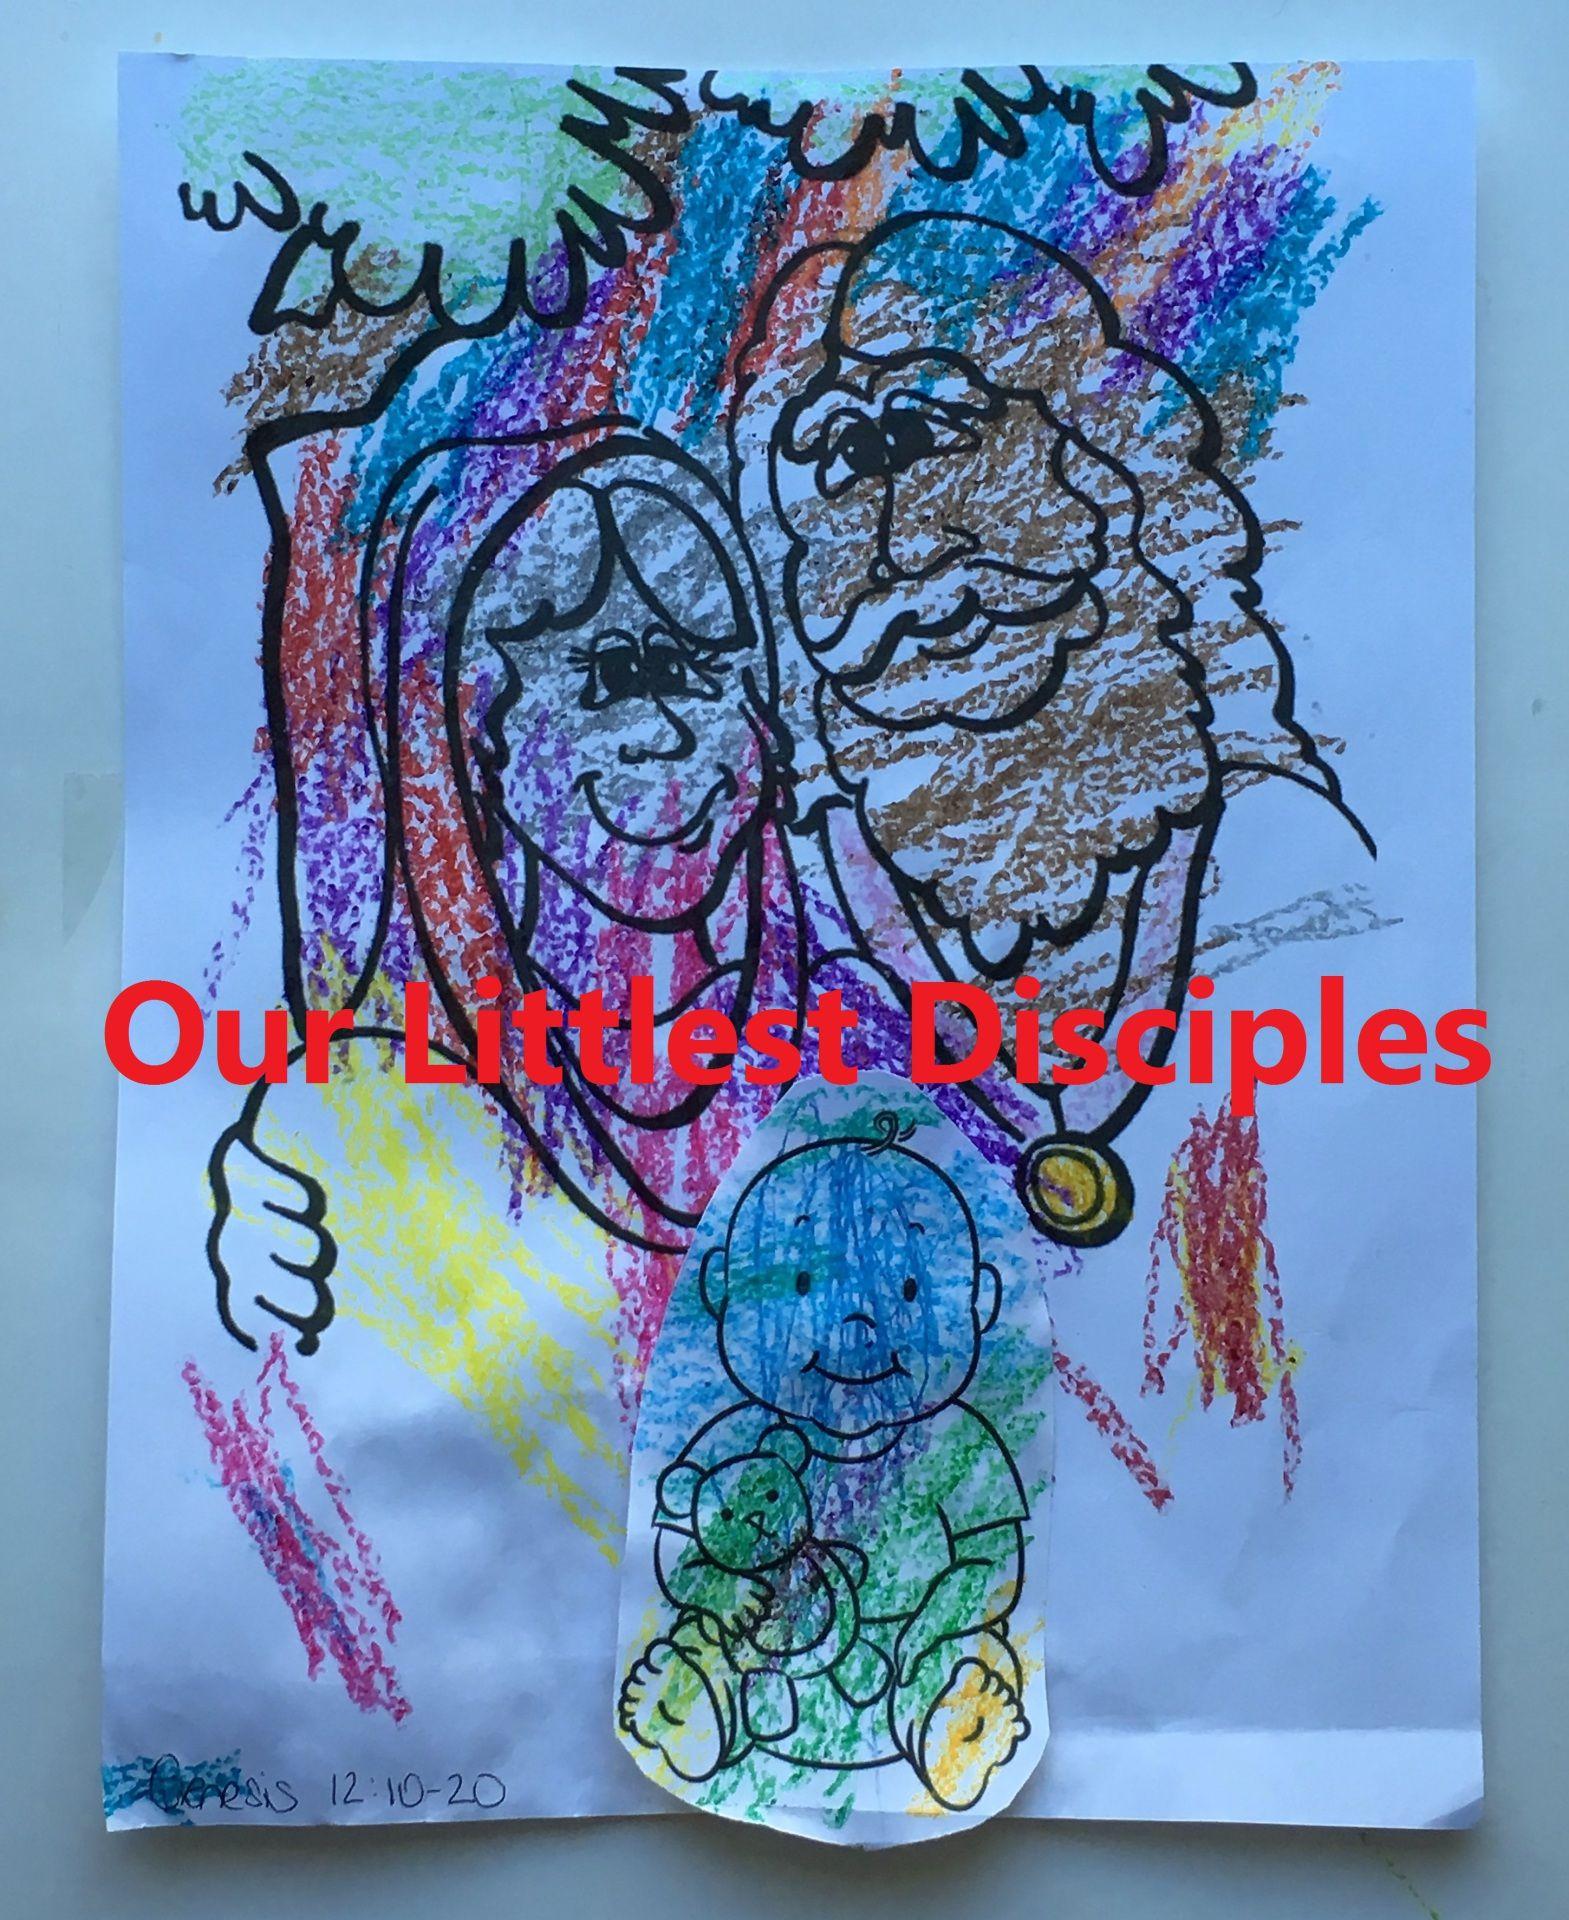 Abraham Abram Sarah Sarai Baby Isaac Coloring Page Craft Activity Genesis 15 7 21 7 Five